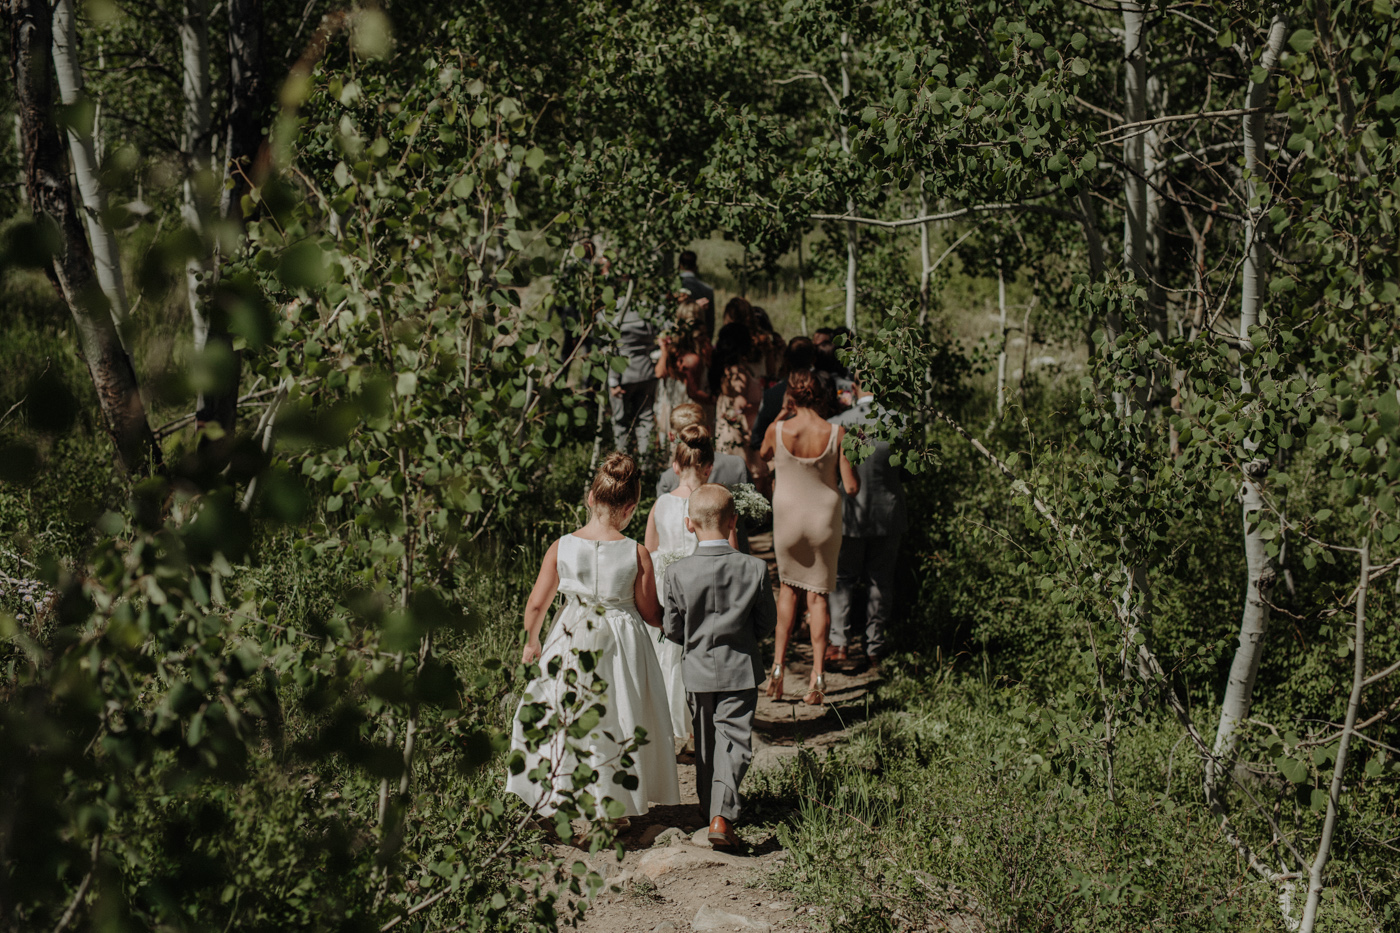 woods-walk-trail-crested-butte-colorado-wedding-61.jpg